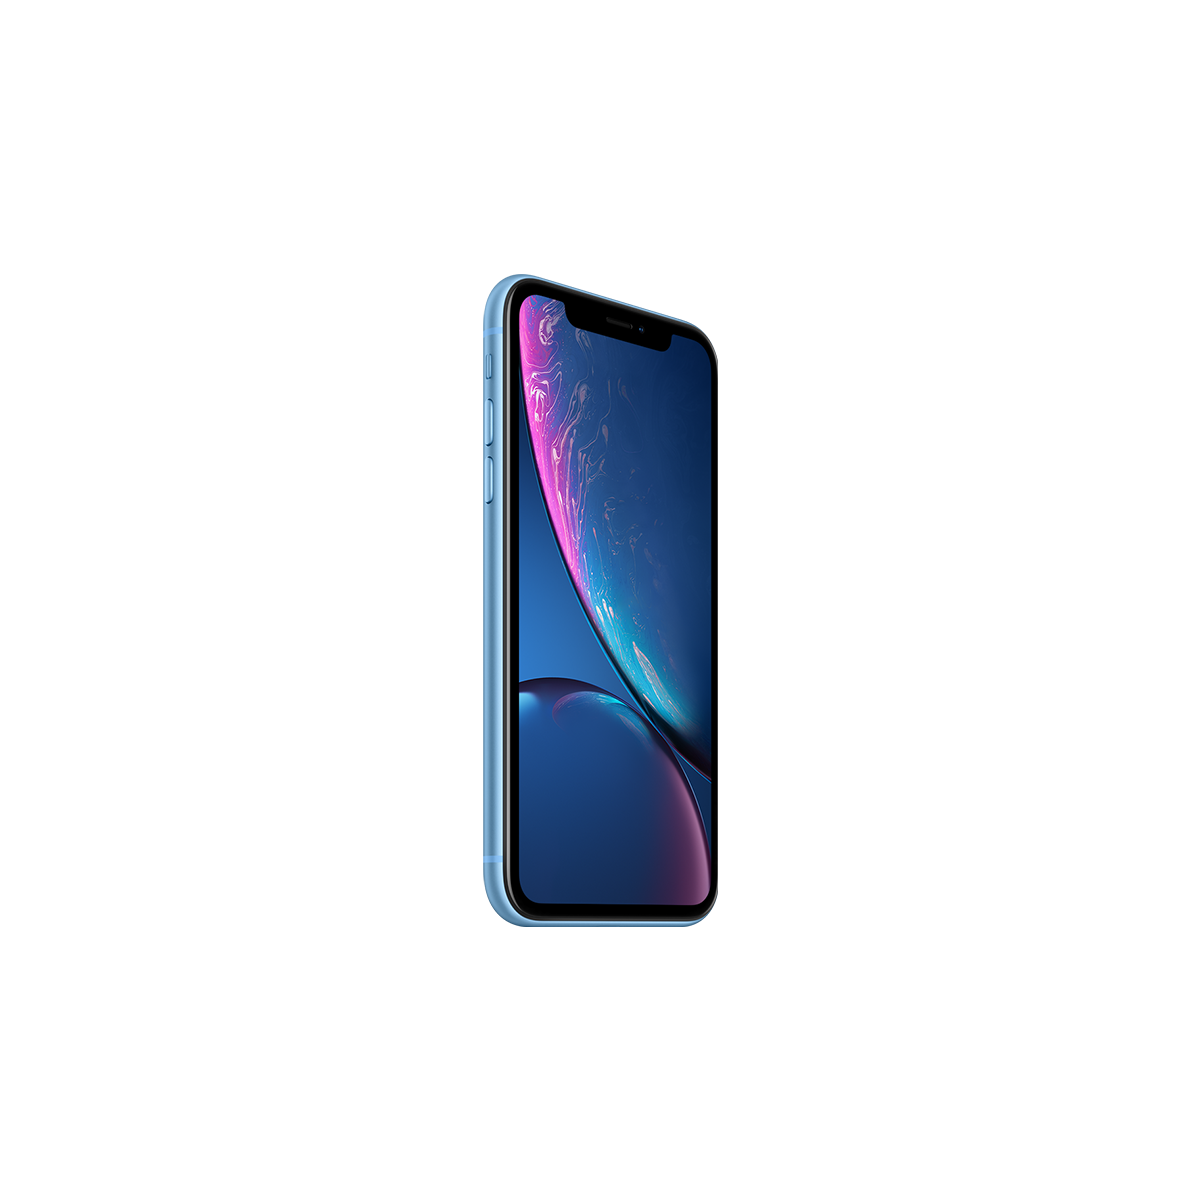 Apple iPhone XR Dual Sim 64 Гб (Синий) 12 месяцев гарантия